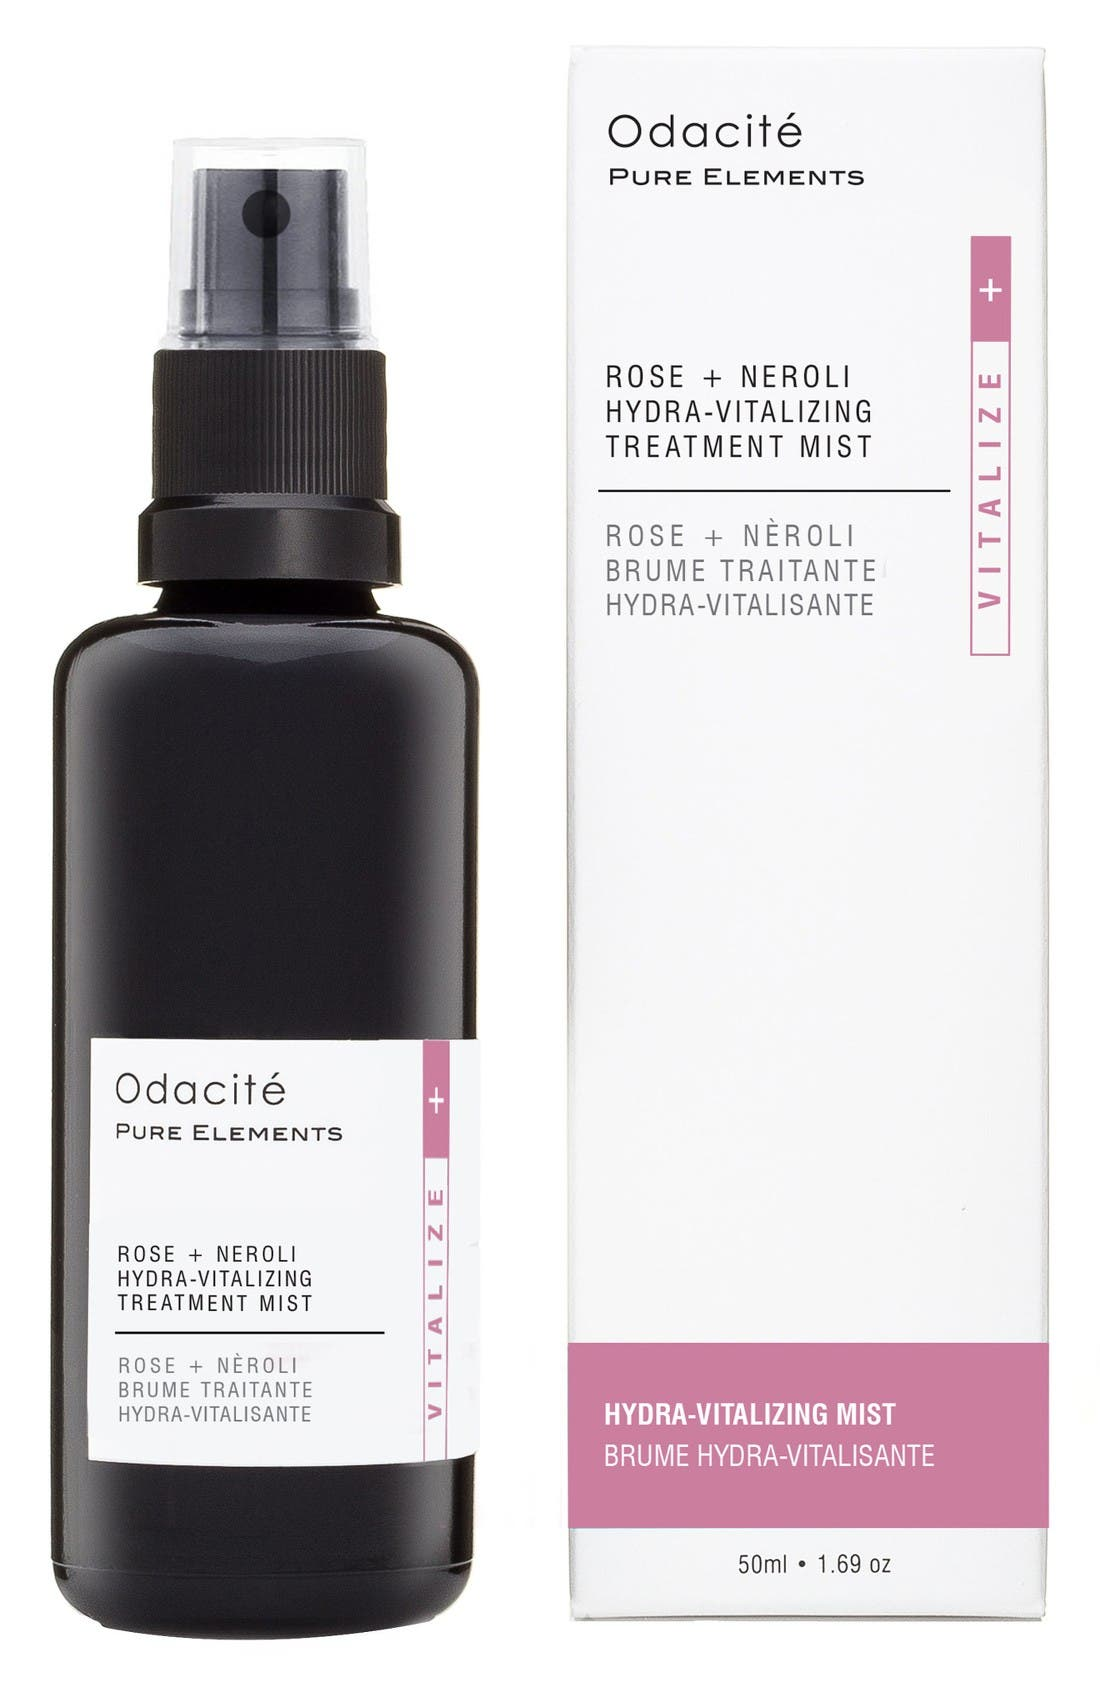 Alternate Image 1 Selected - Odacité Rose + Neroli Hydra-Vitalizing Treatment Mist